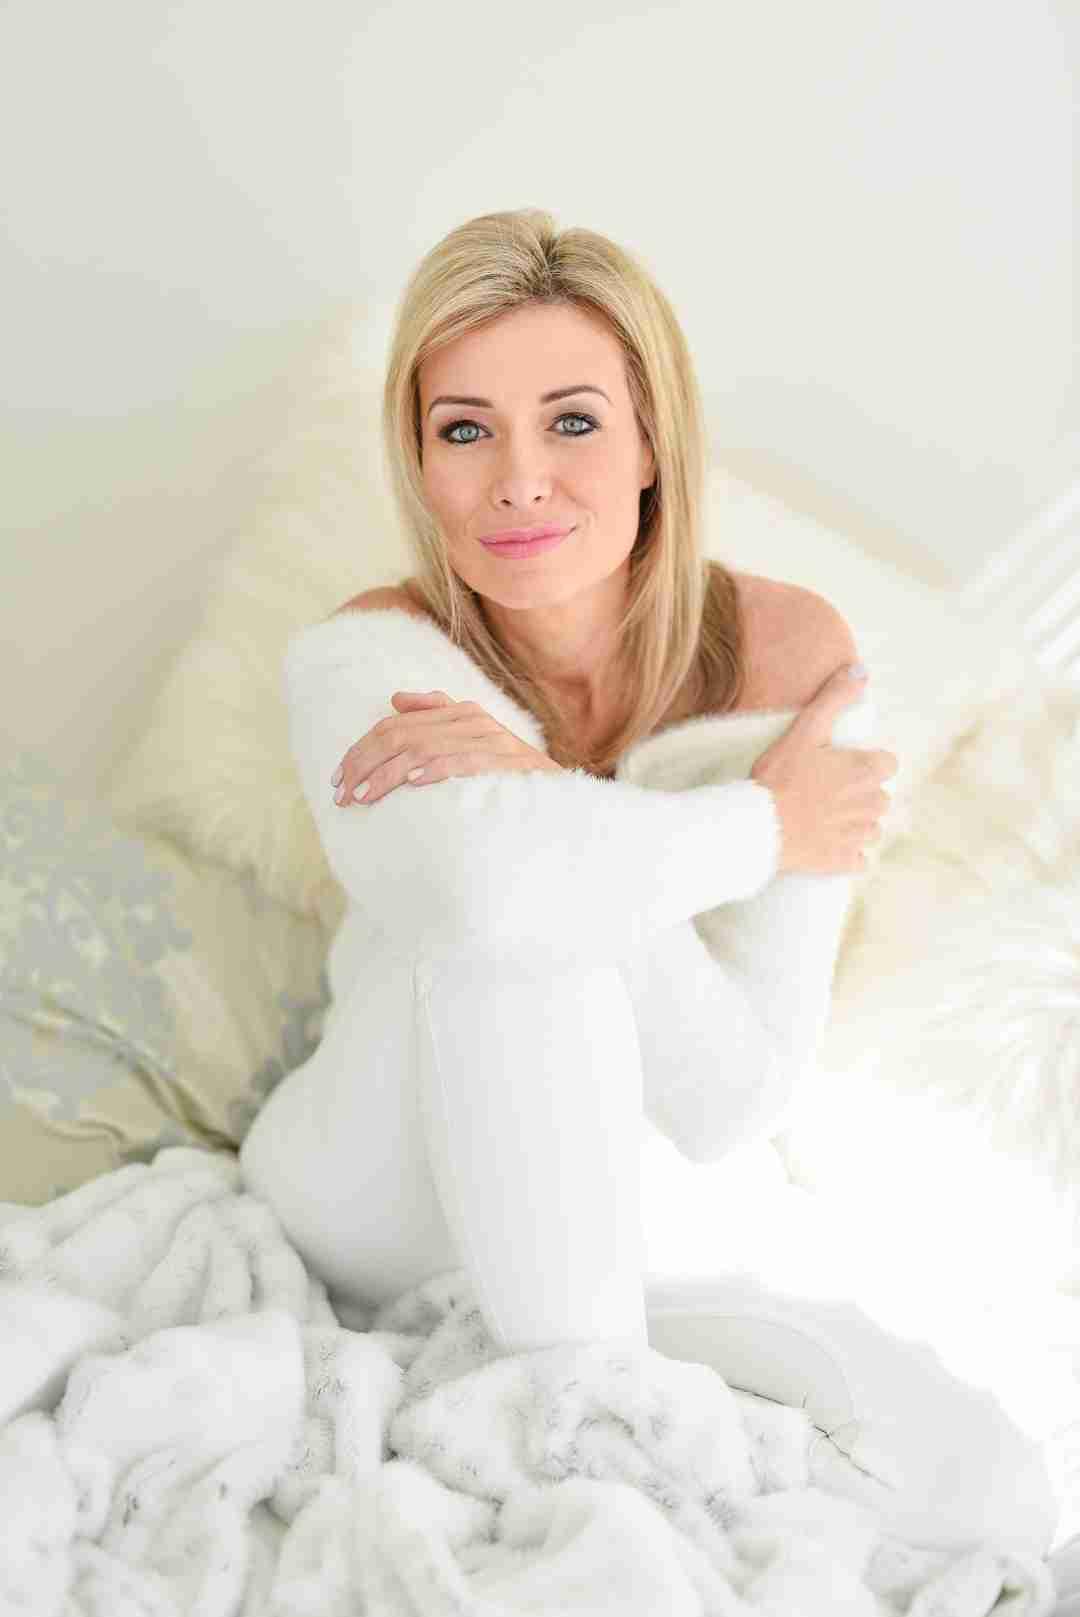 Tanya Kunze | LeadershipBooks.store